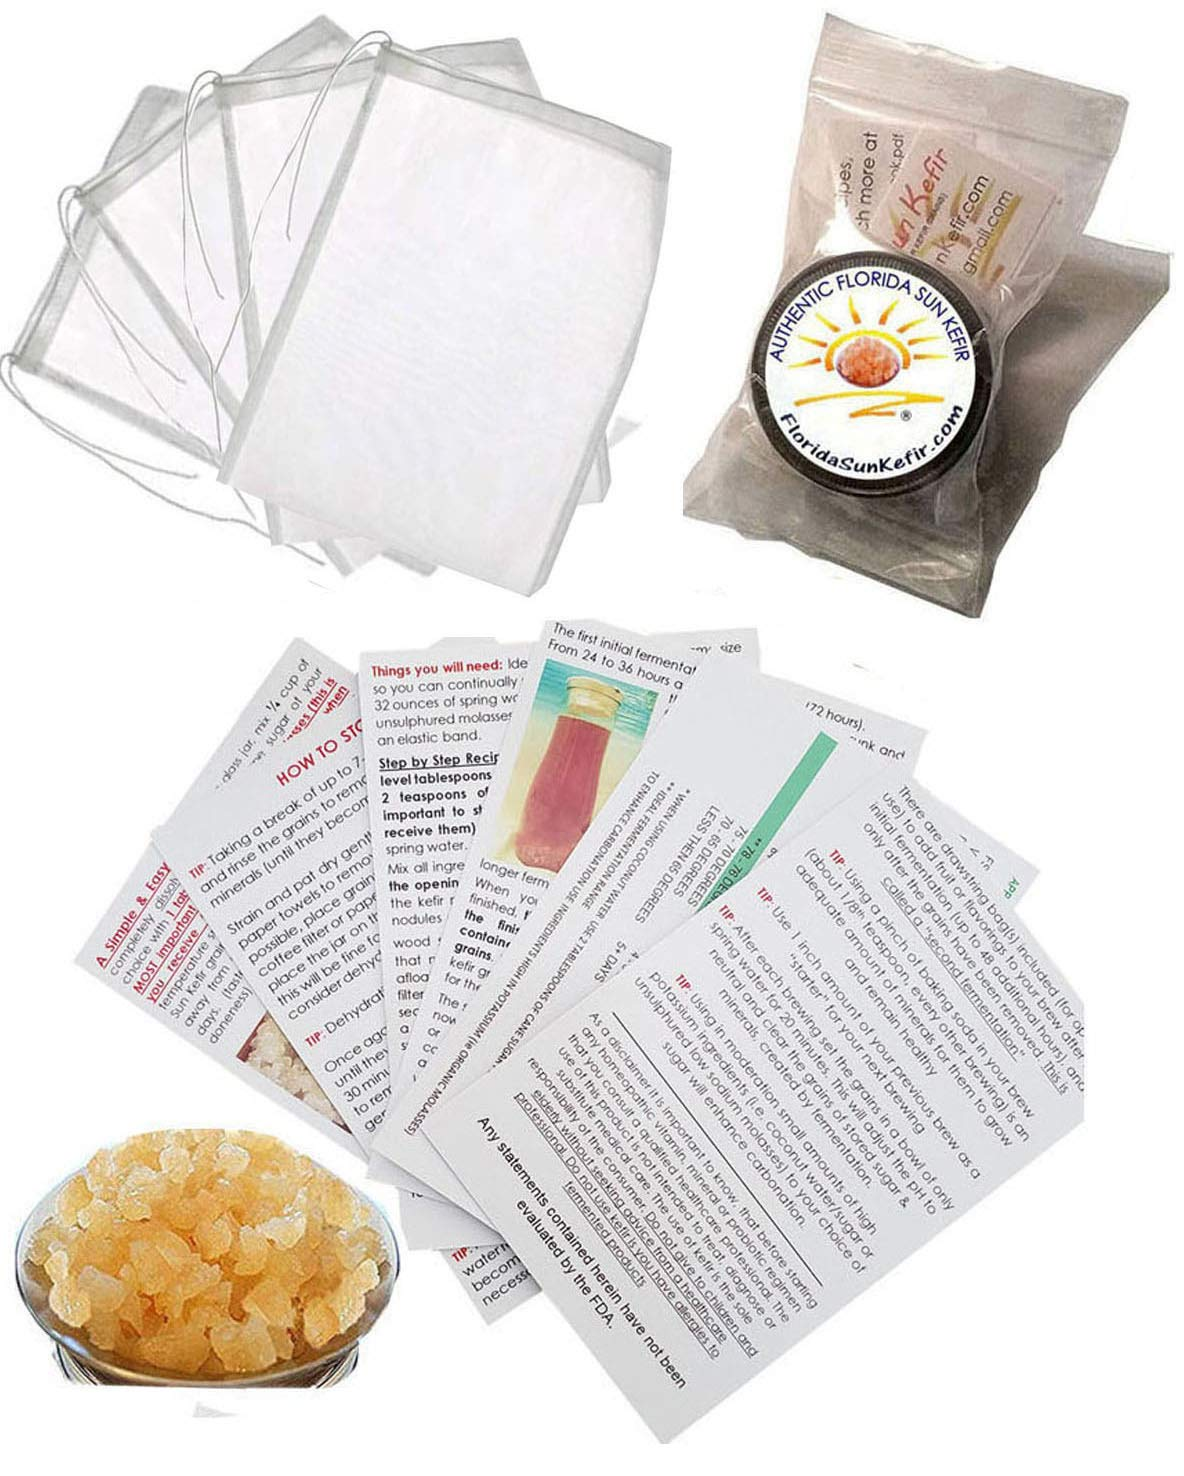 GENEROUS QUARTER OFFicial Cup of Live Kefir Sun Grain Water Popular products Florida